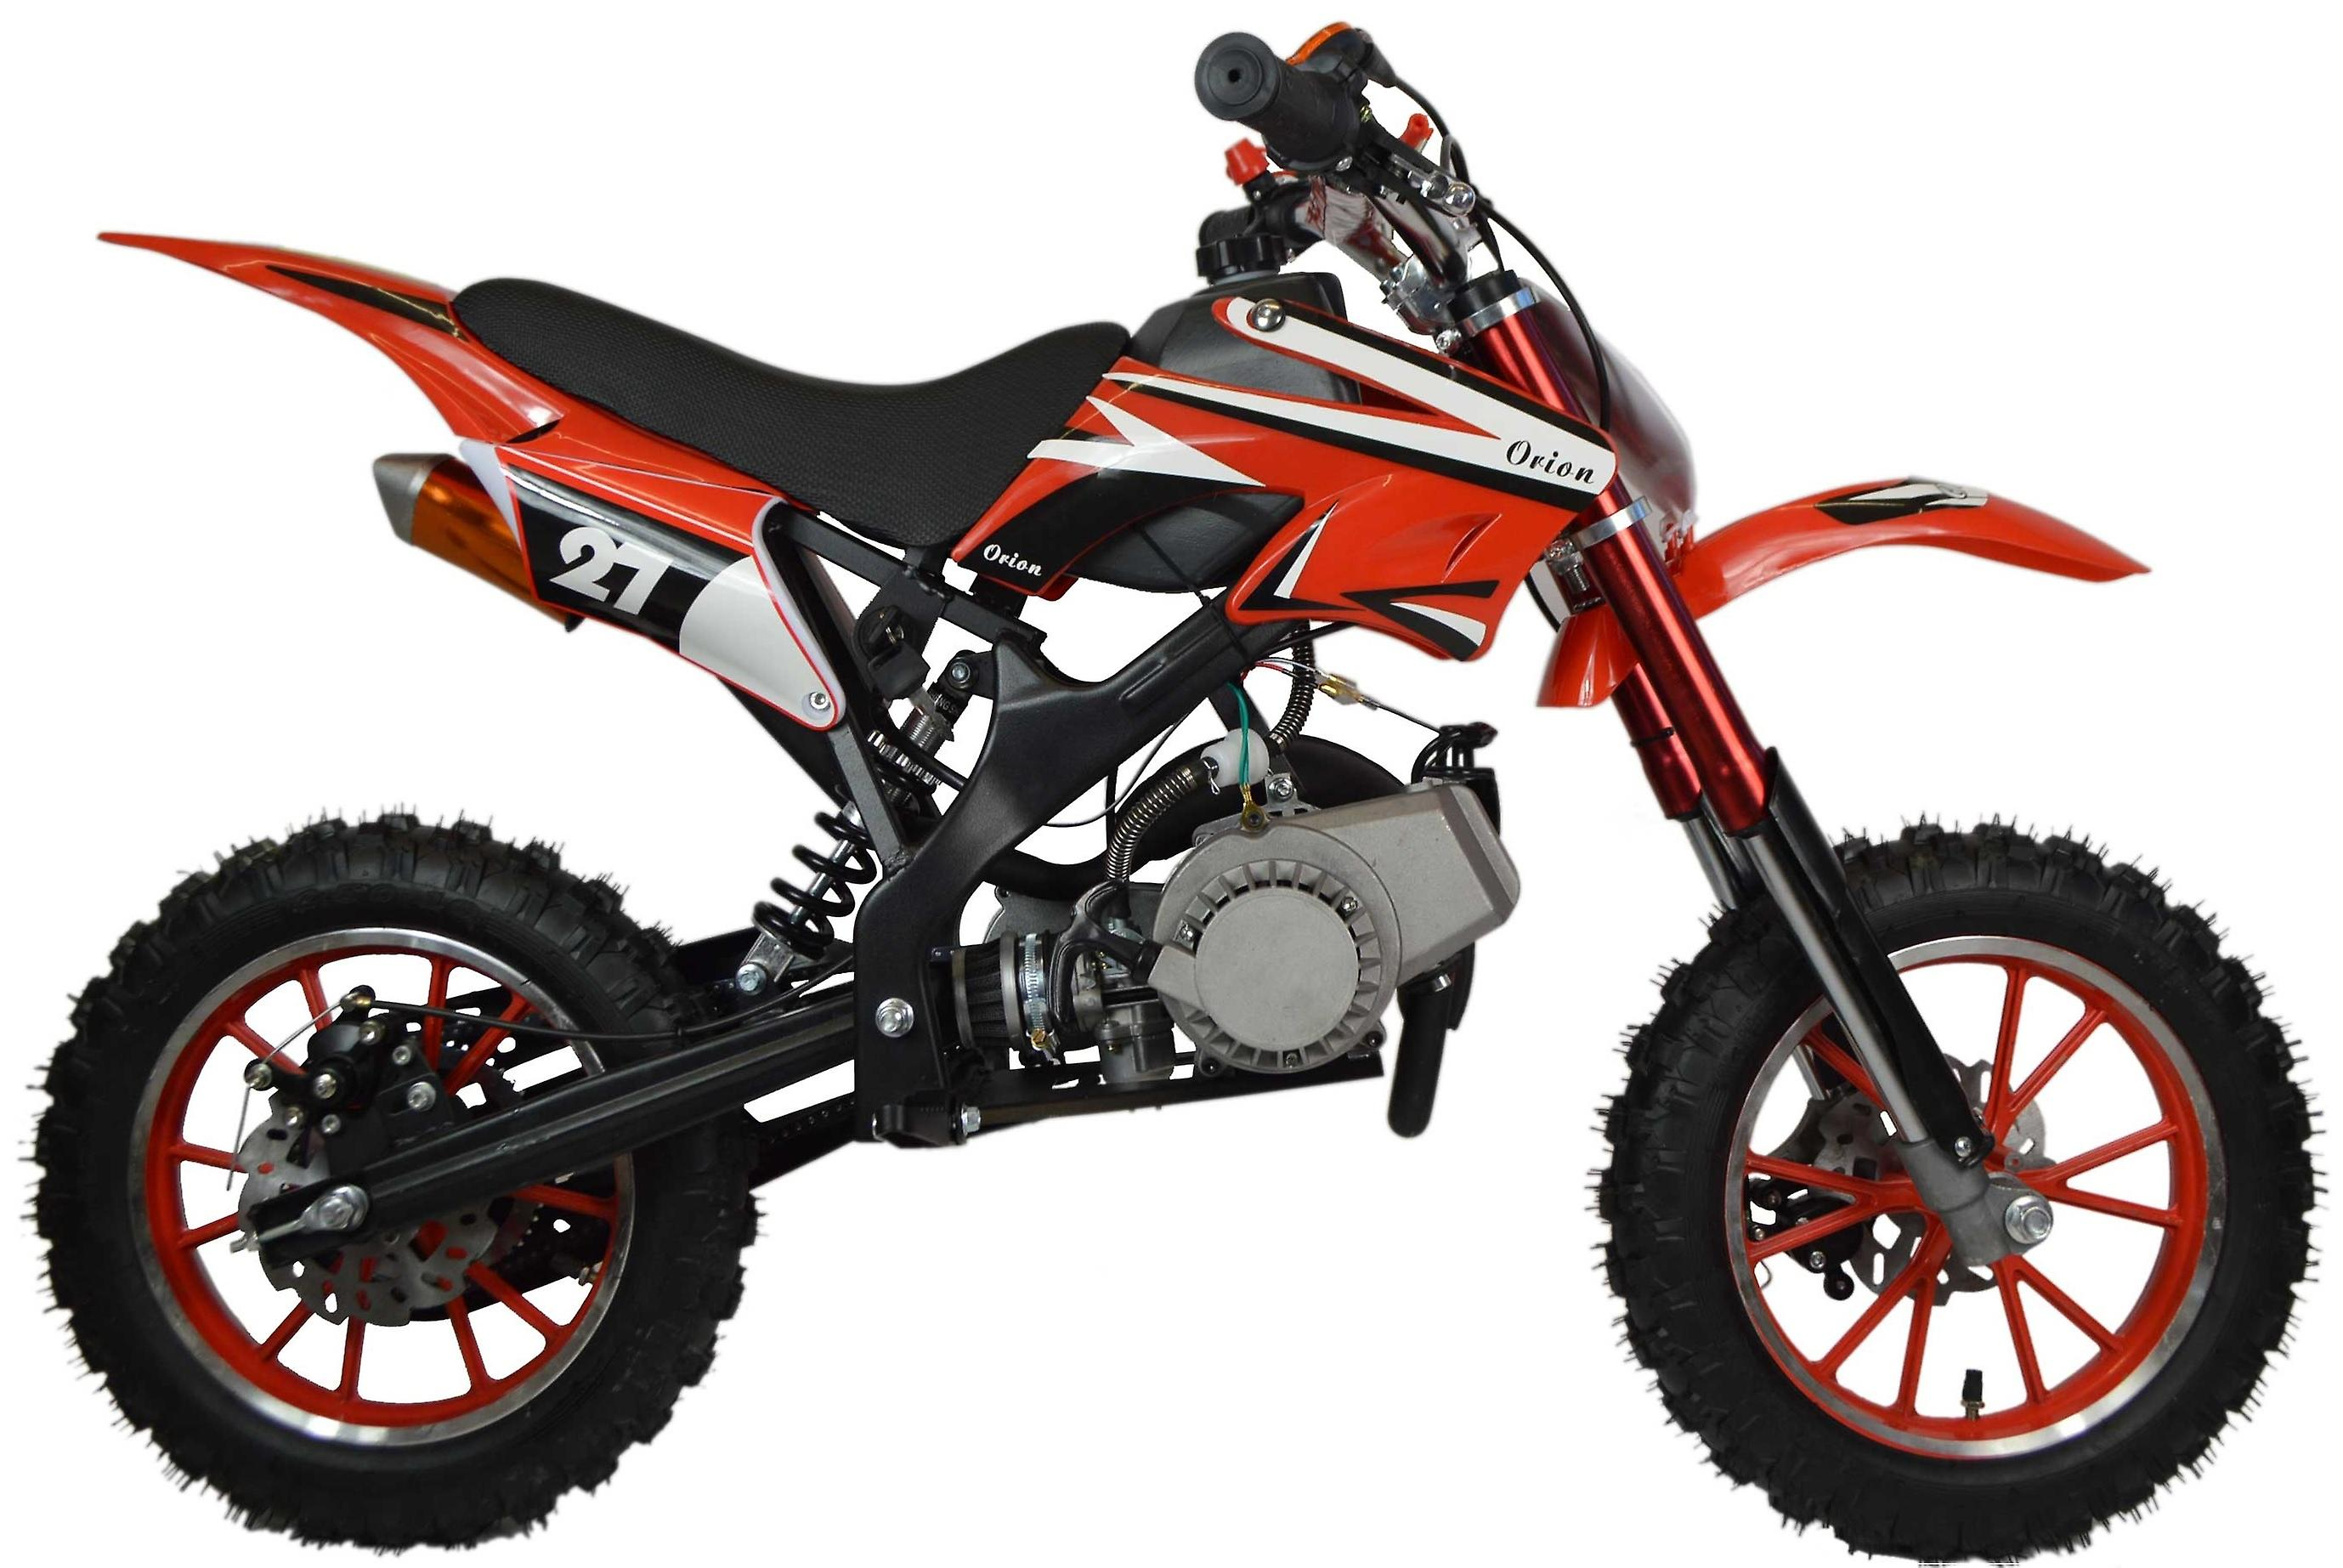 Zipper 50cc Petrol Mini Kids Dirt Motorbike - Red